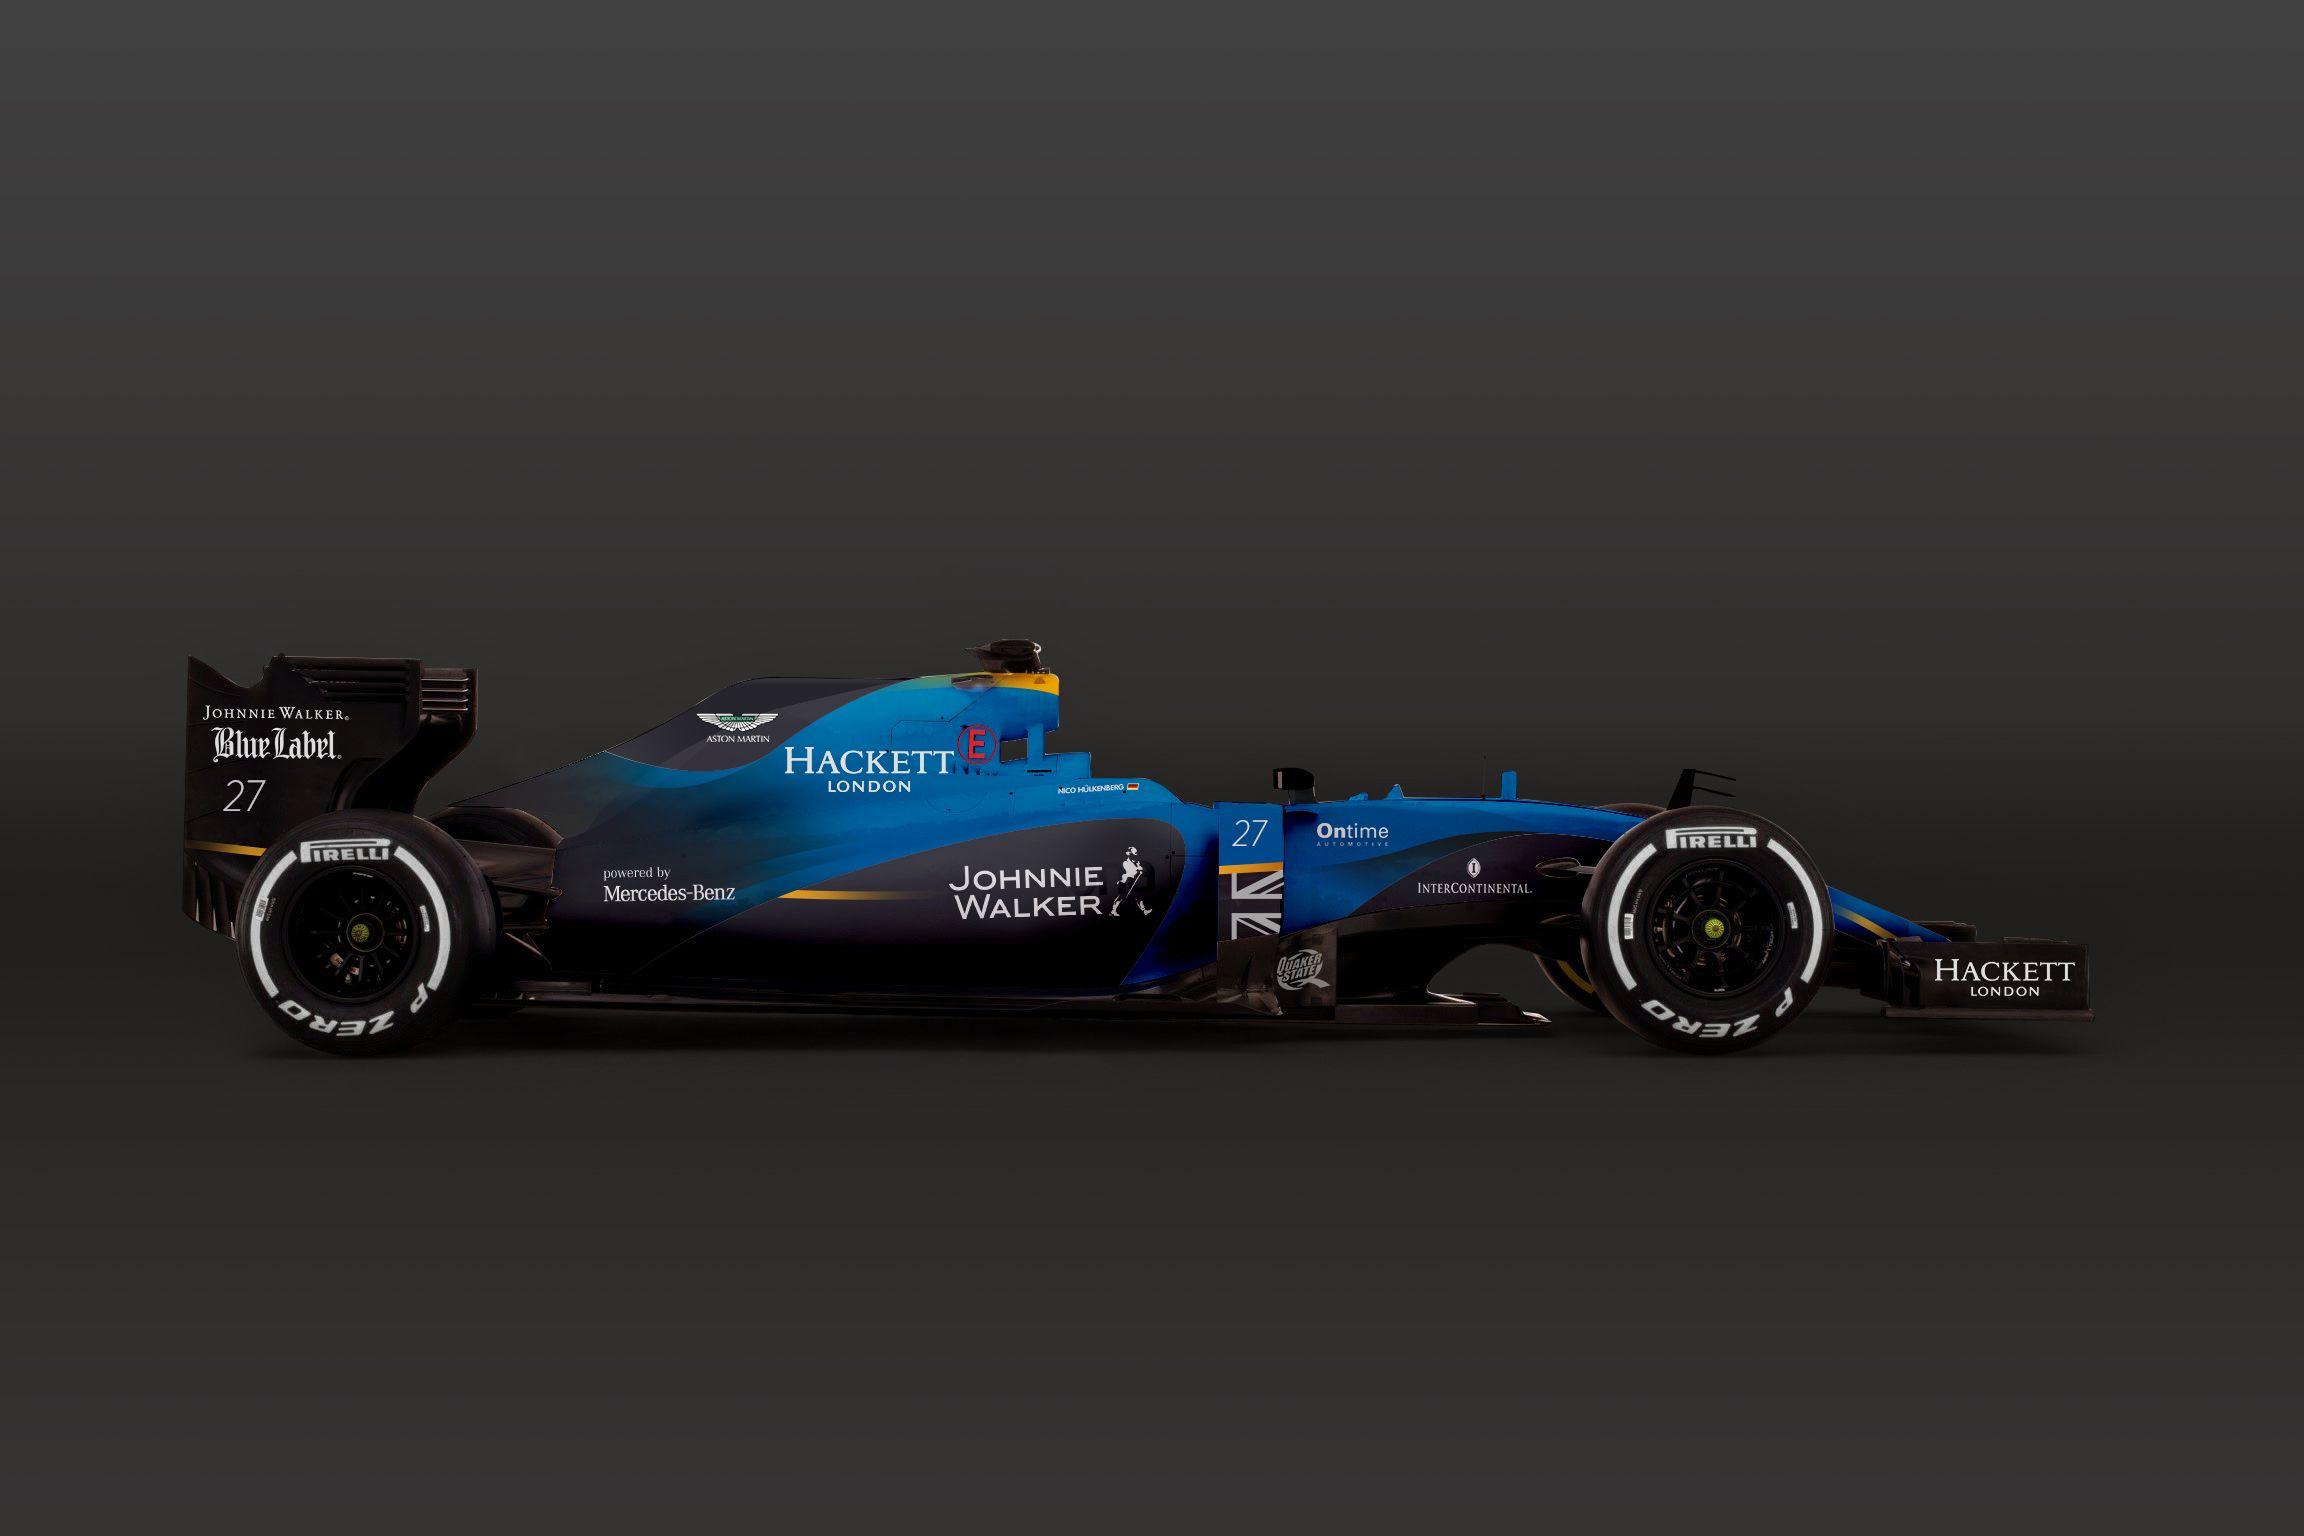 2017 aston martin f1 | f1 & race car | pinterest | aston martin